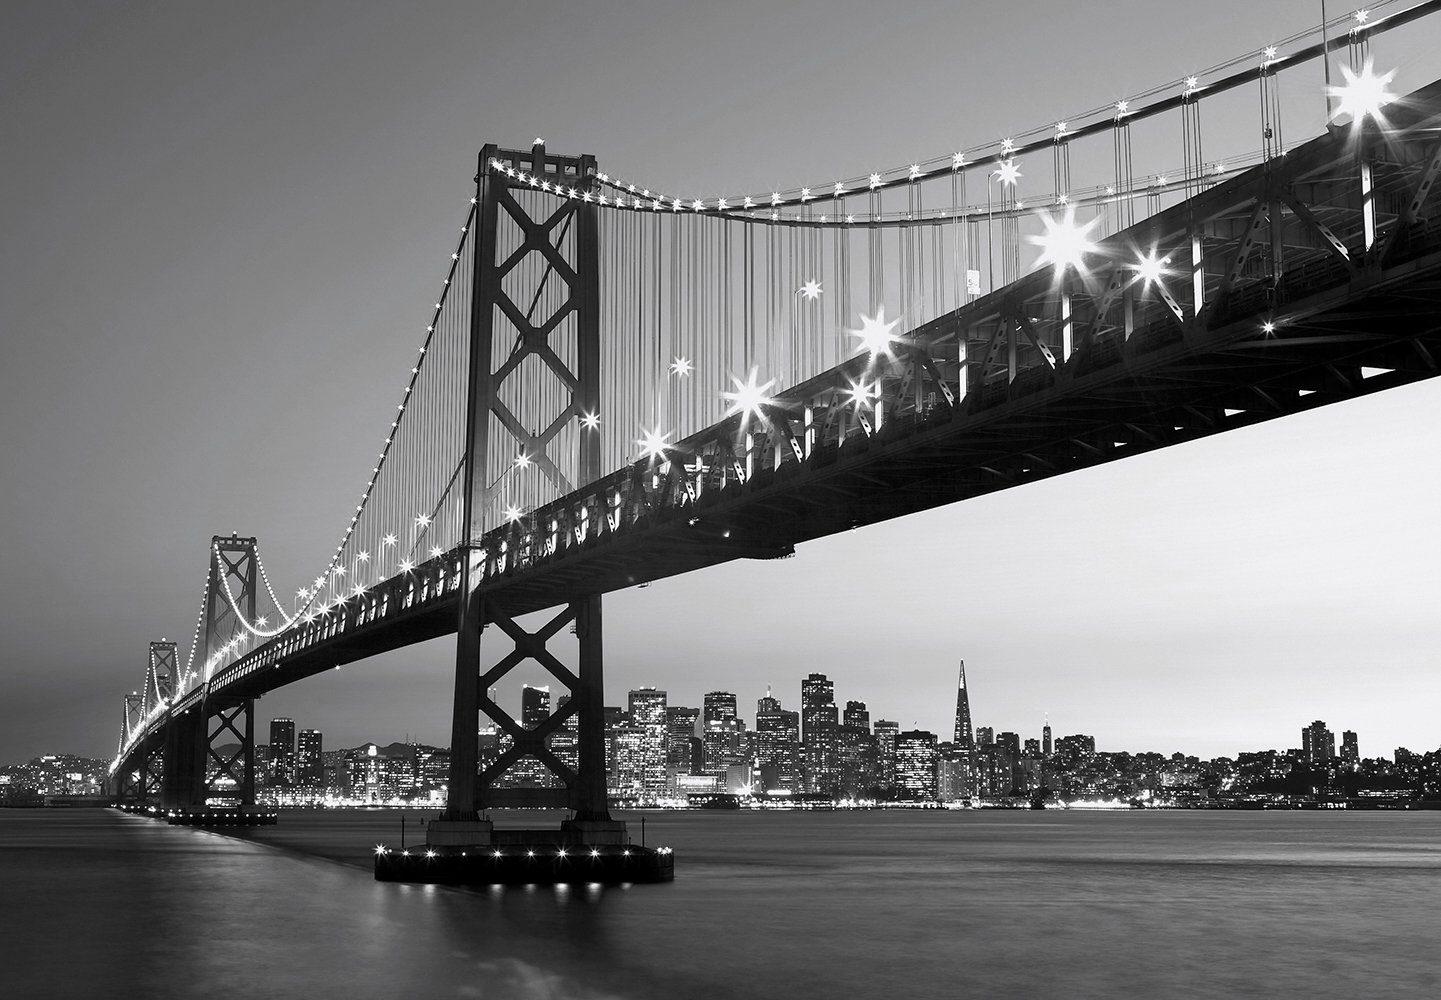 Fototapete »San Francisco Skyline«, 8-teilig, 366x254 cm